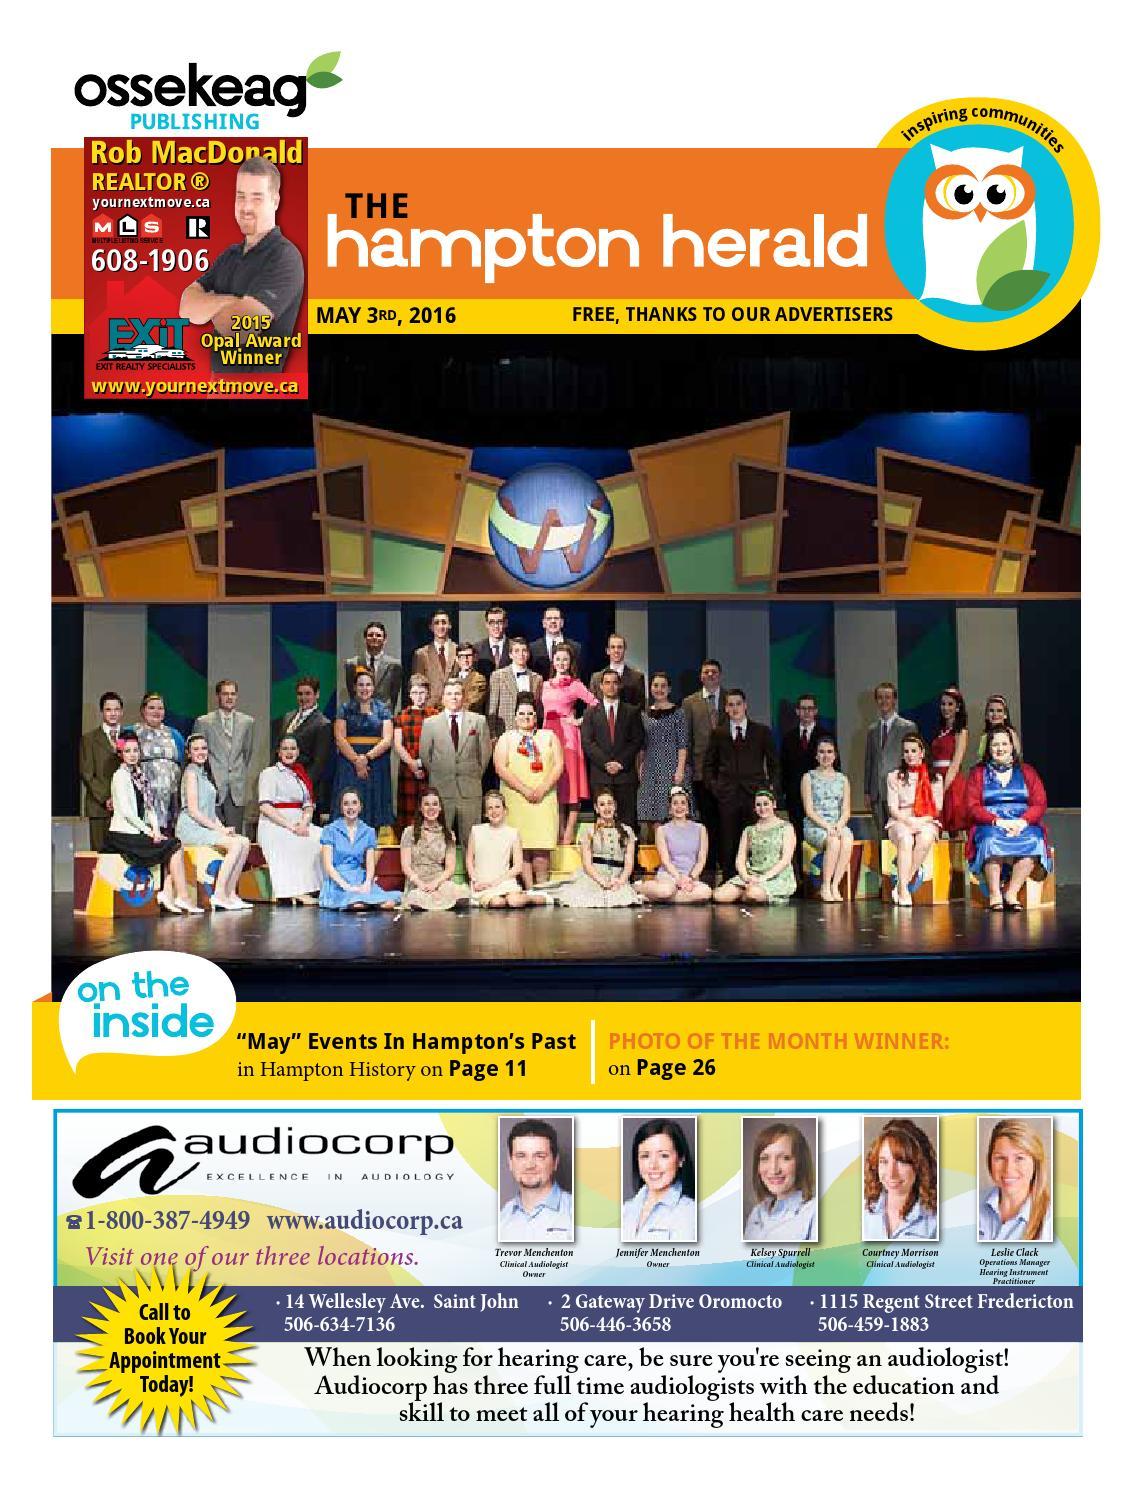 hampton herald may 3 2016 by ossekeag publishing co ltd issuu